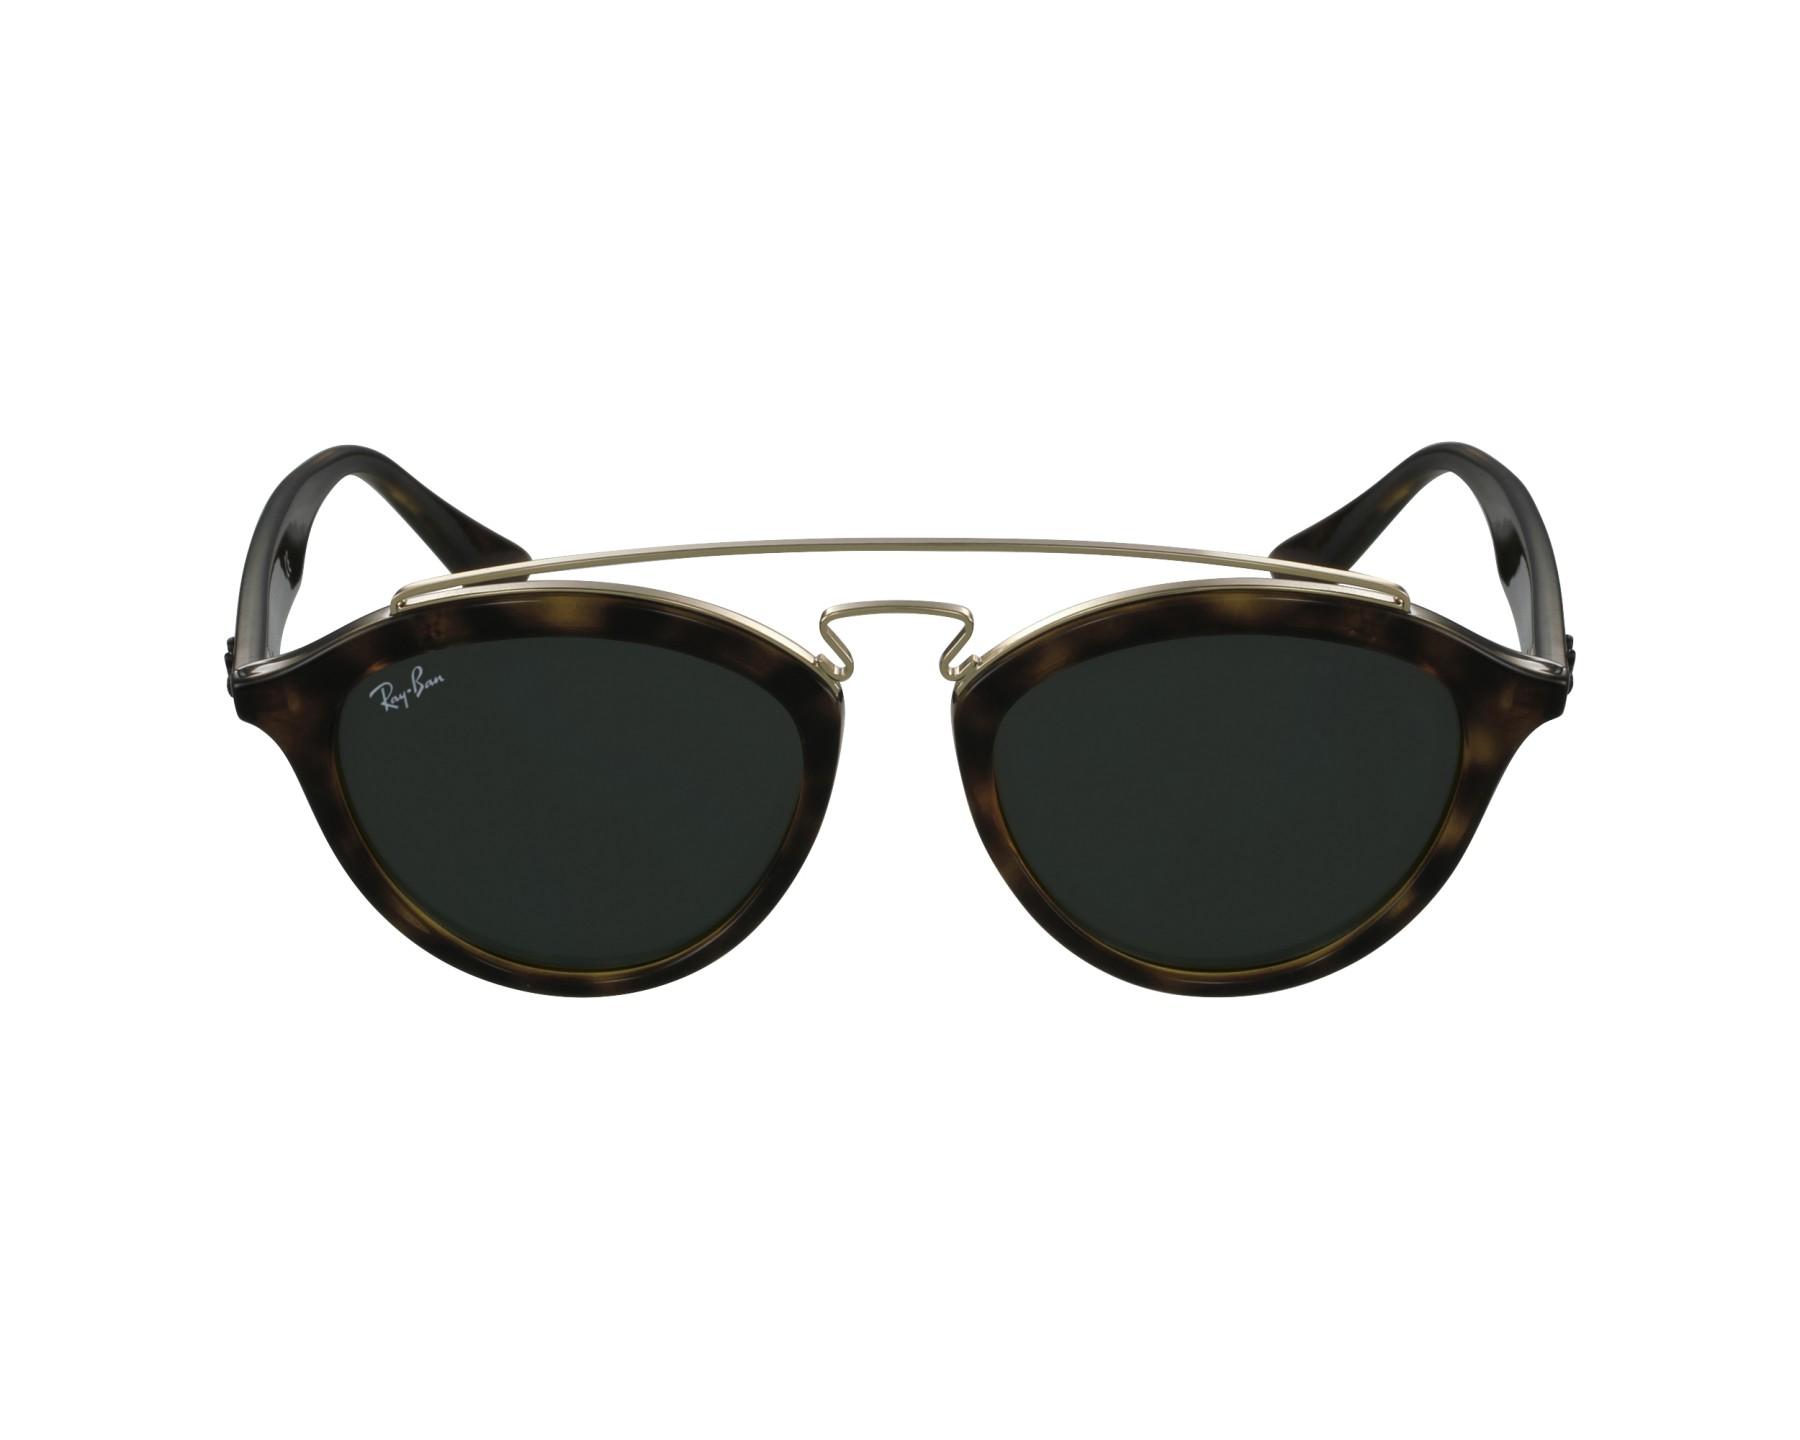 23205b30b9 Sunglasses Ray-Ban RB-4257 710 71 53-19 Havana Gold profile